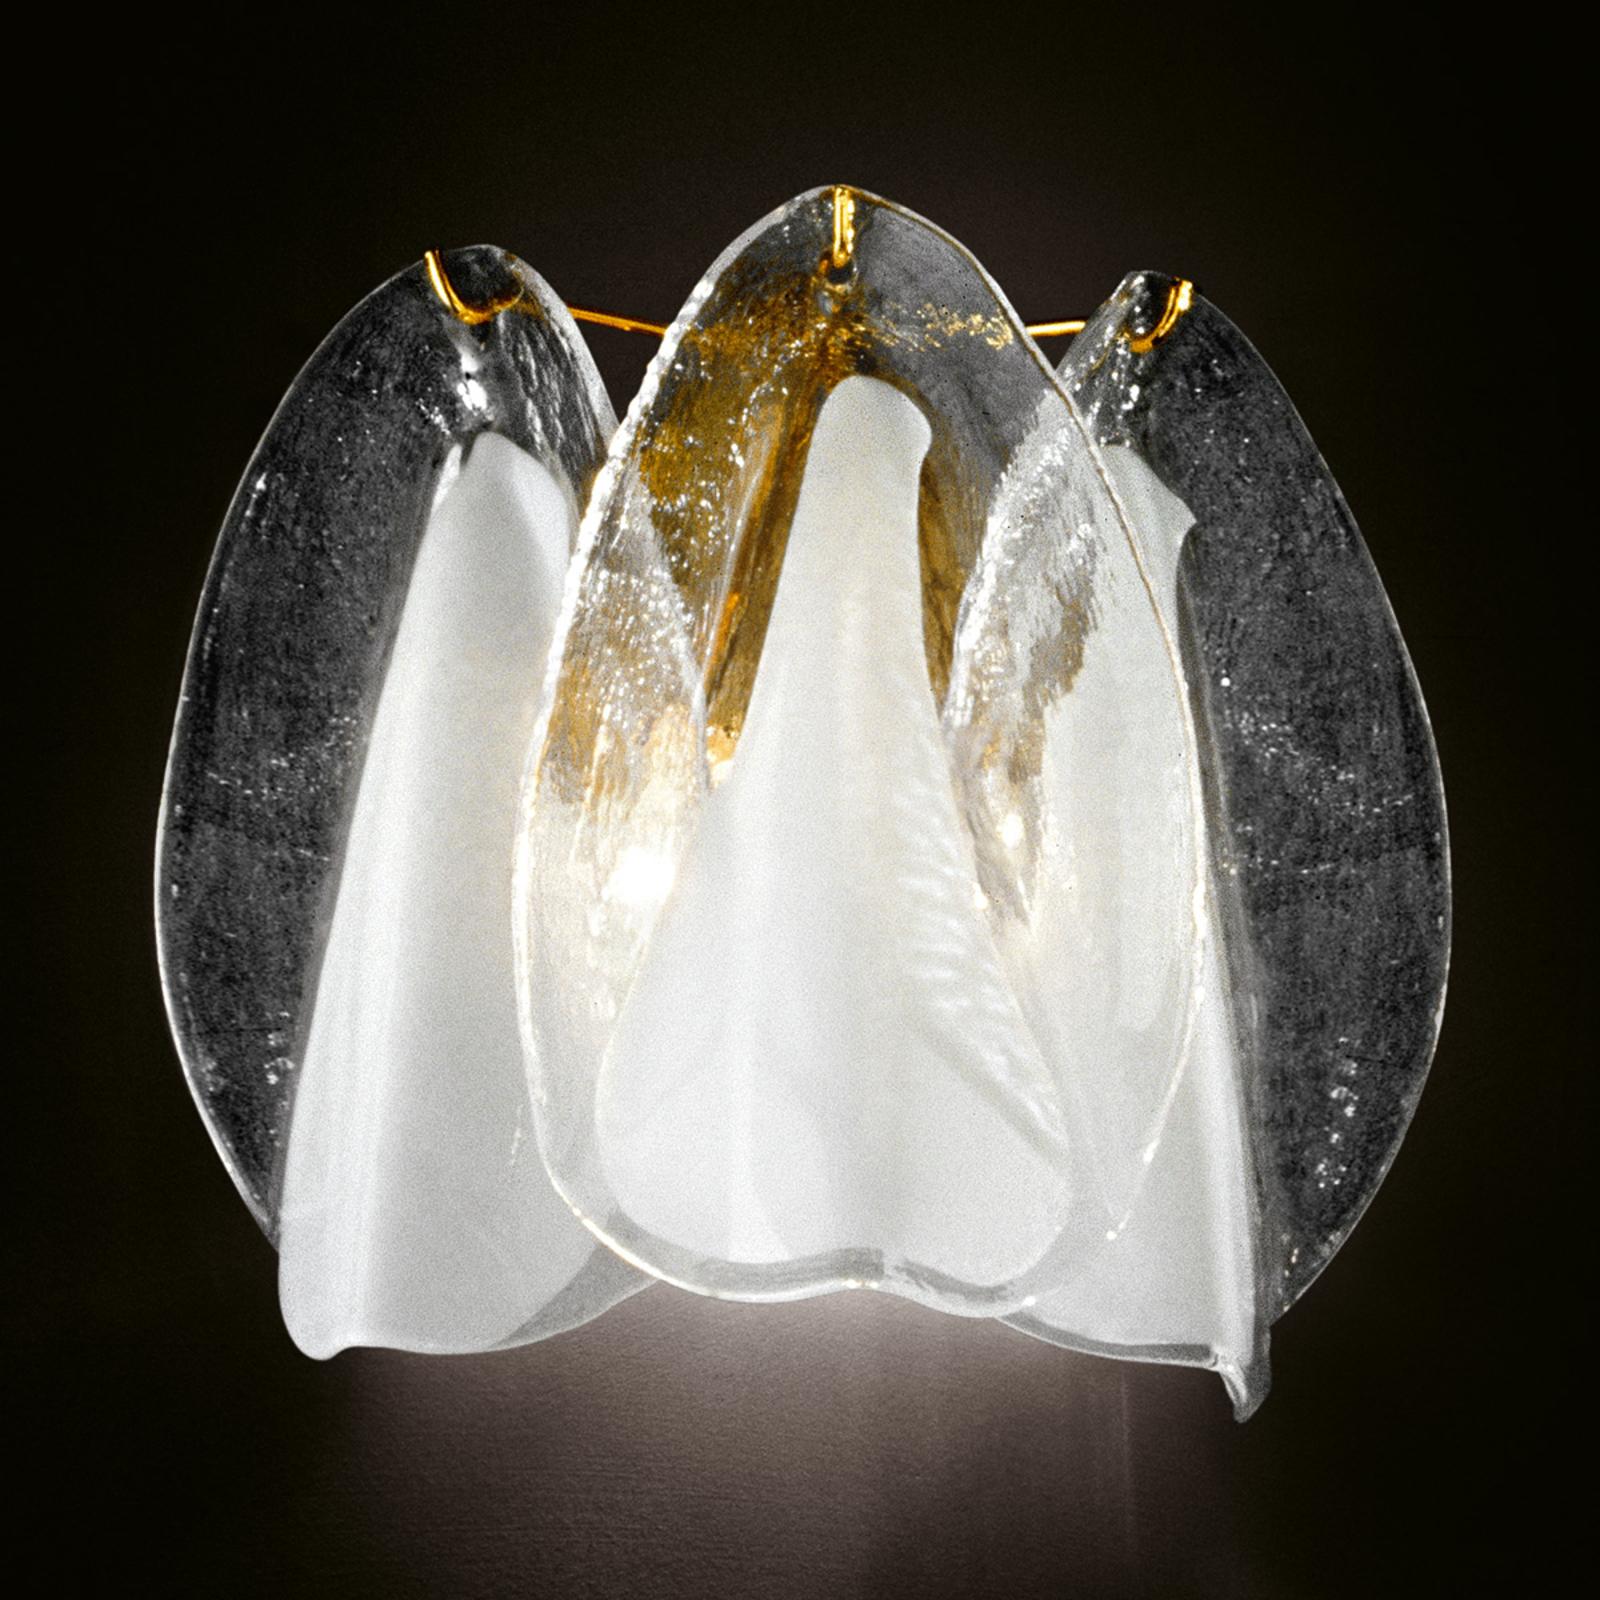 Glazen wandlamp Rondini met 24 karaats goud